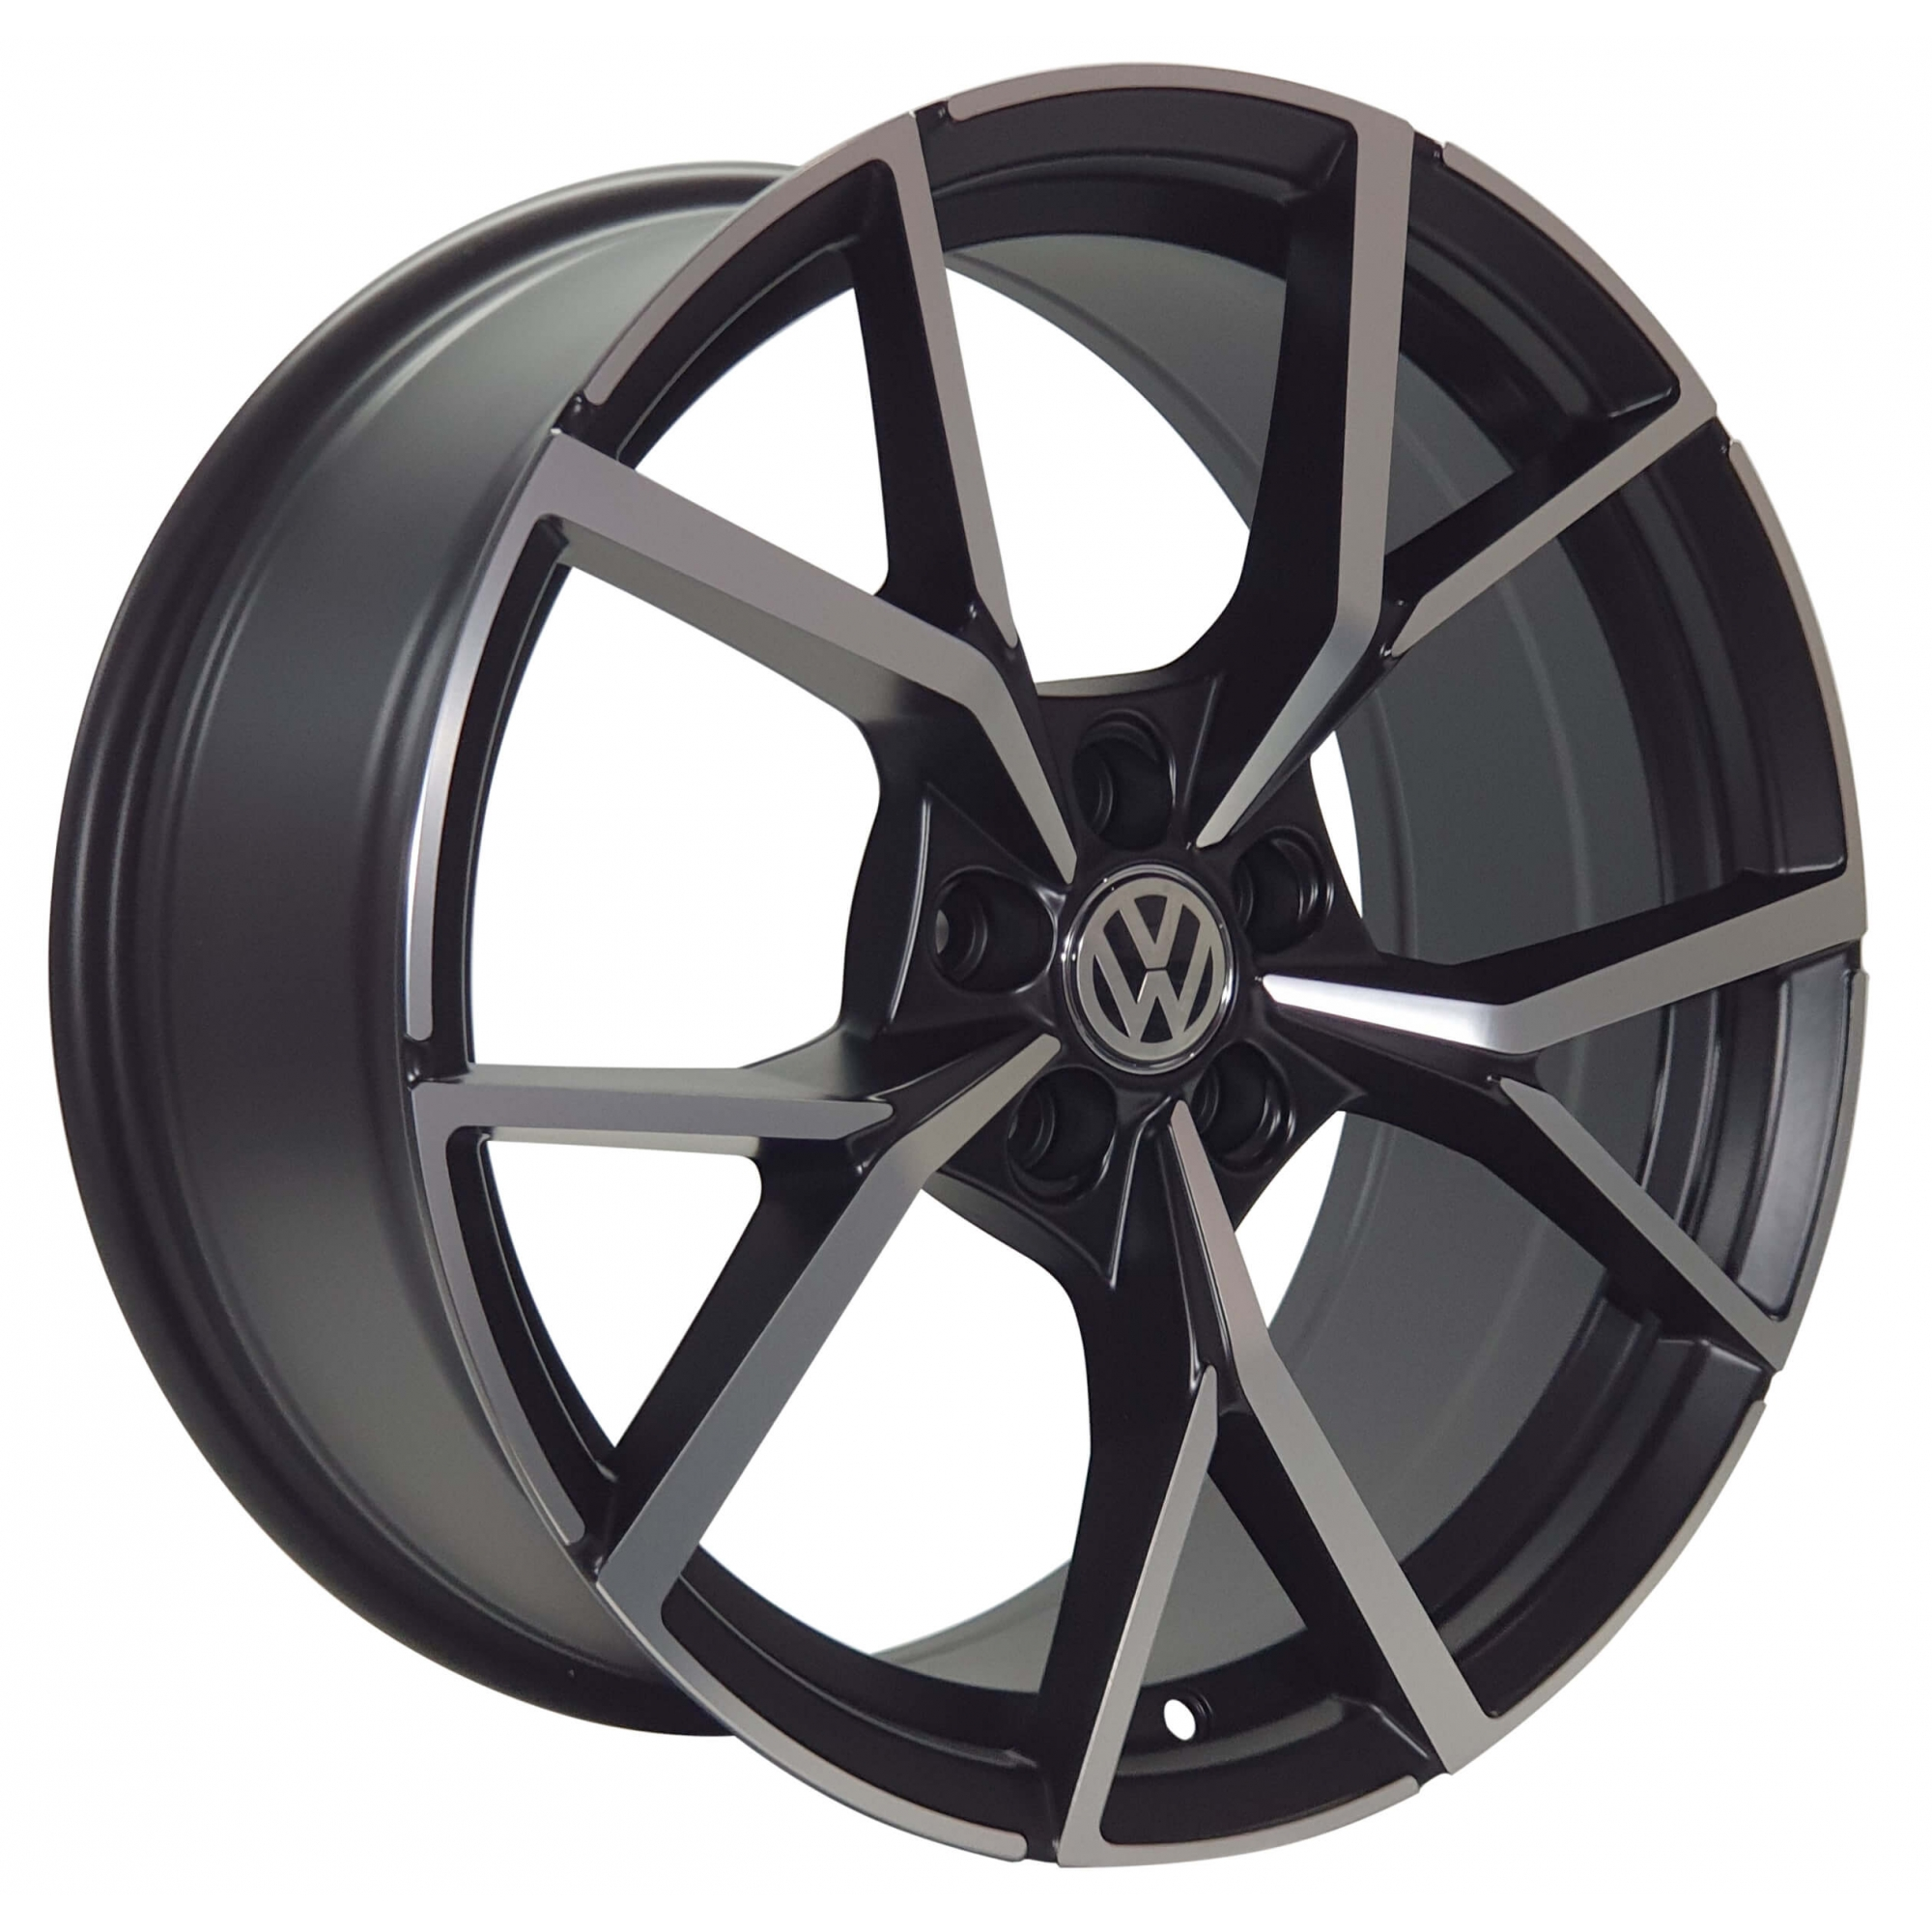 Jogo Rodas VW Touareg R/Golf R Aro 18x80 5x100 Preto Semi Brilho Diamantado